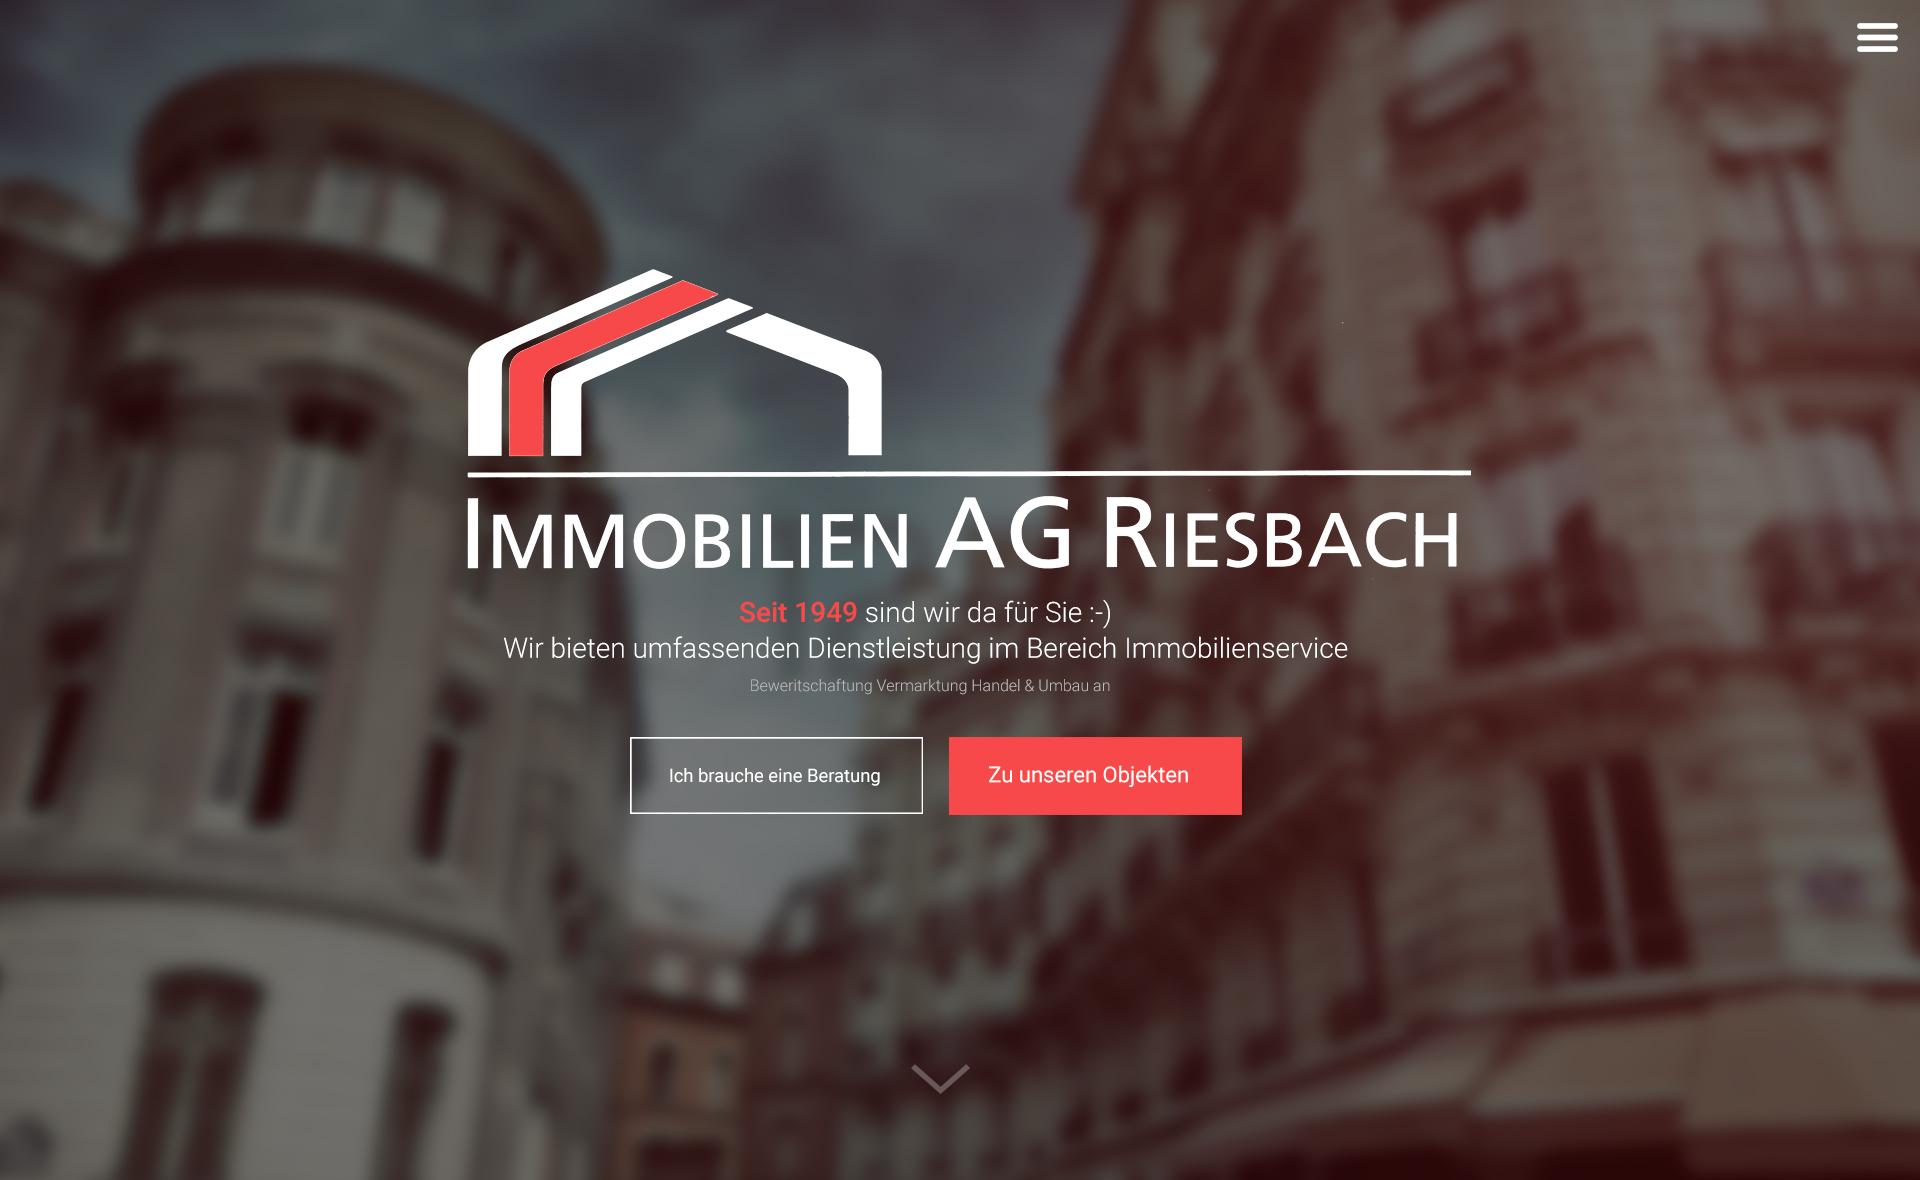 Immoriesbach_home